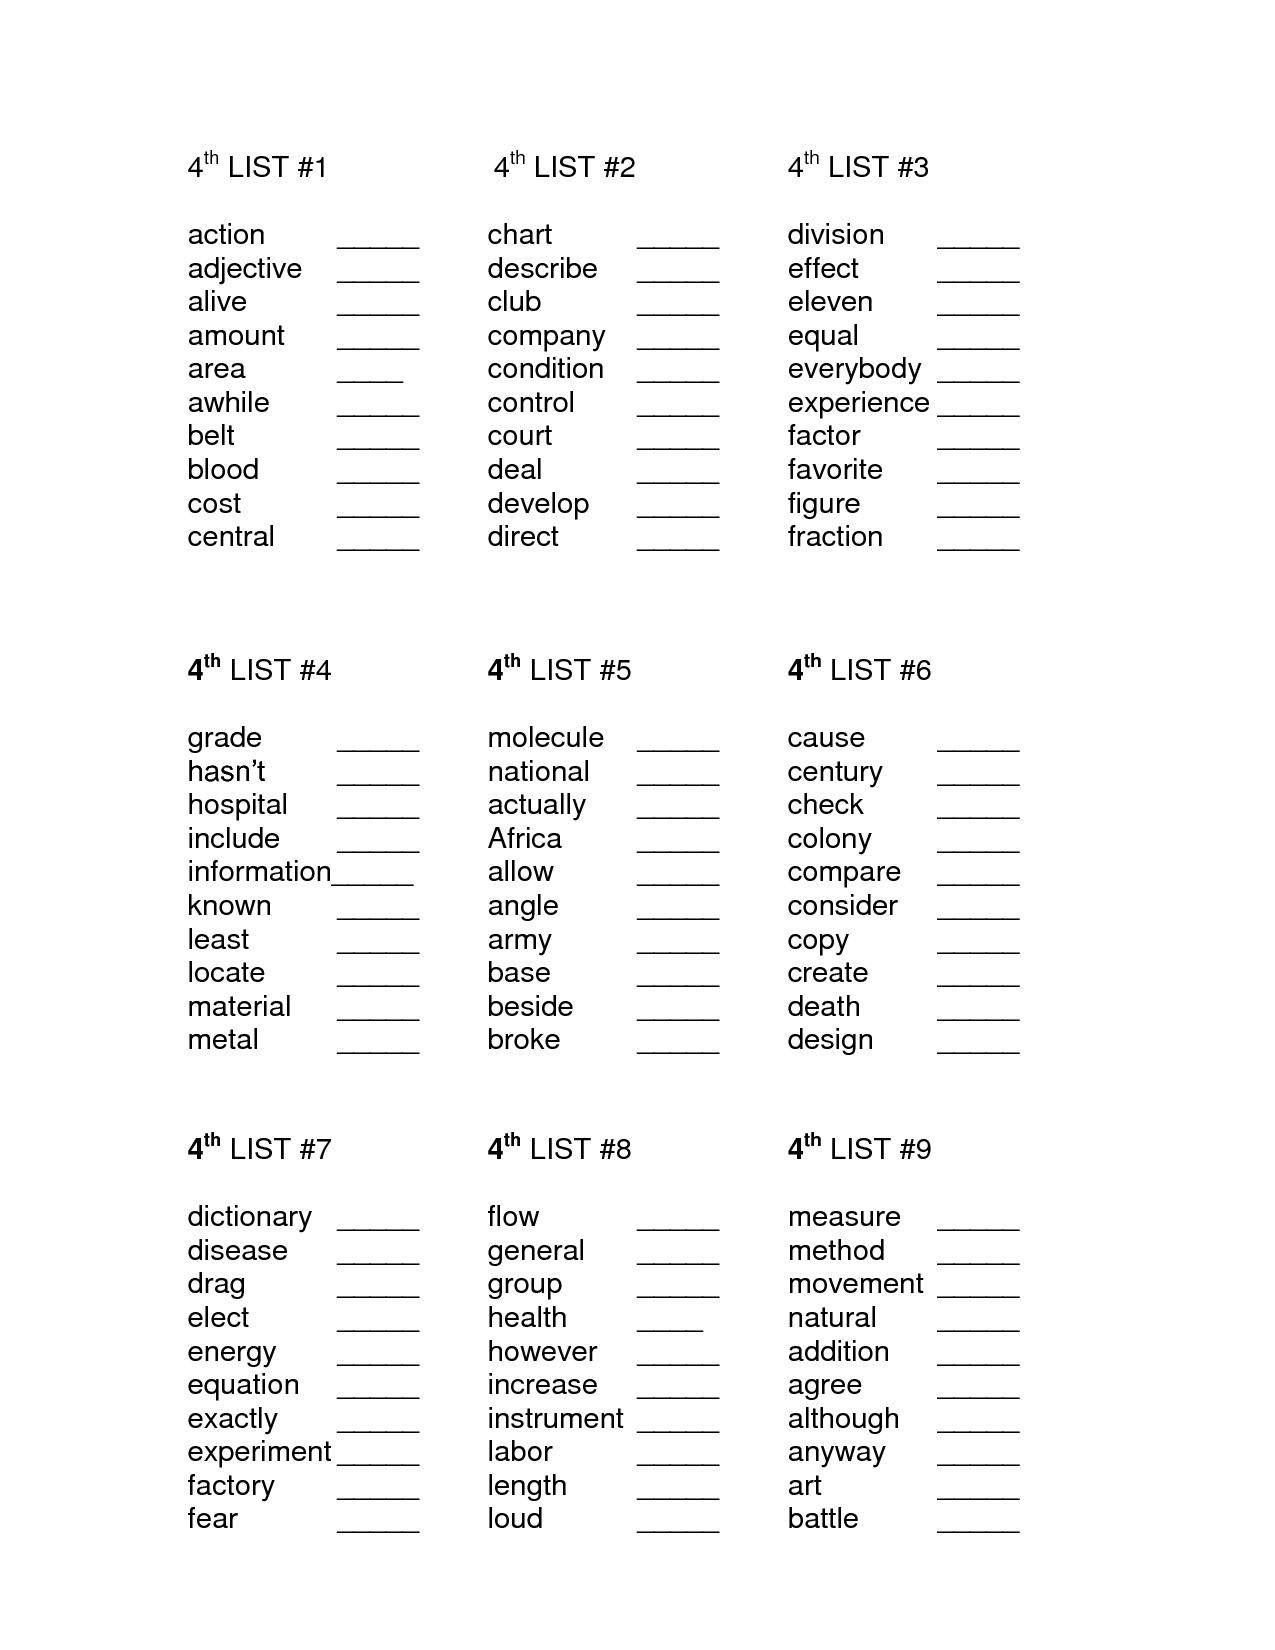 17 Best Images Of Fourth Grade Words Printable Worksheets